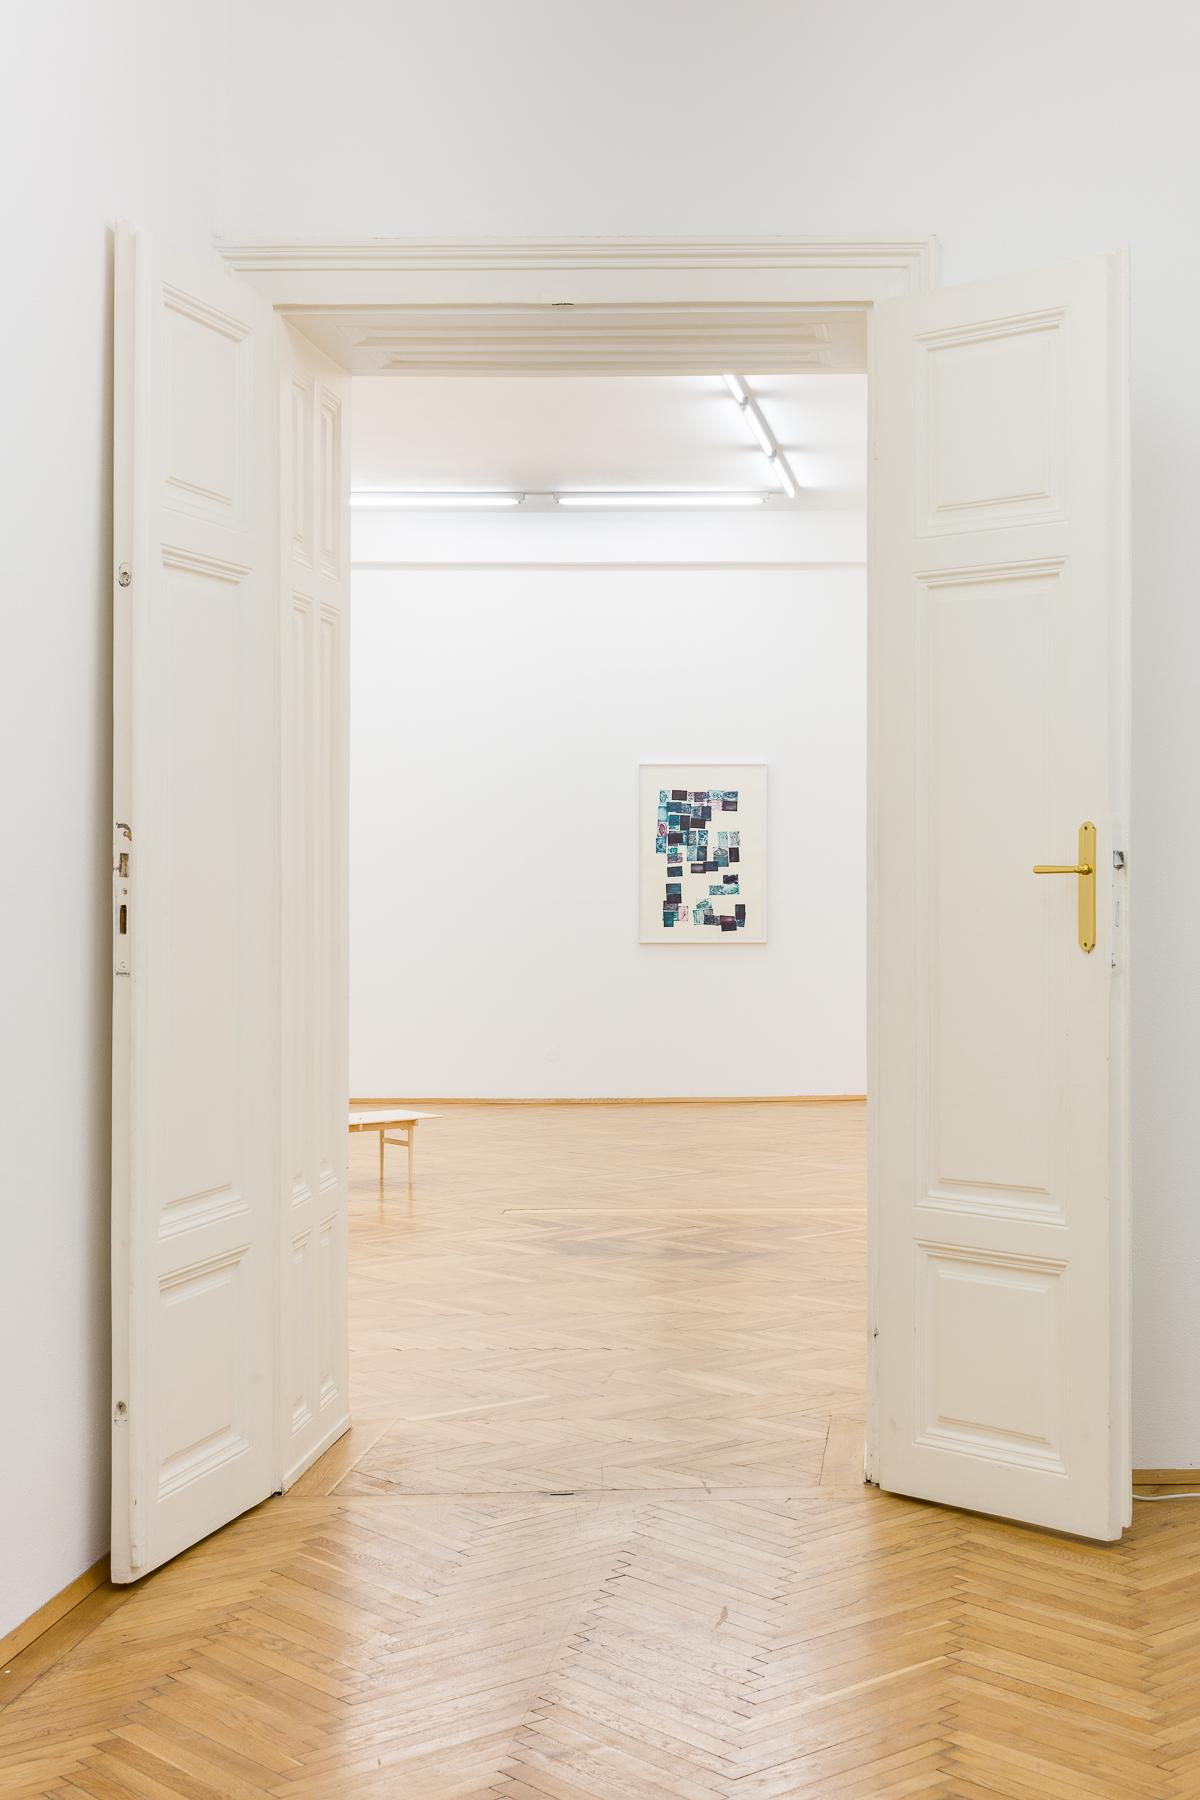 2019_01_25_Knut Ivar Aaser at Felix Gaudlitz_by kunst-dokumentationcom_022_web.jpg